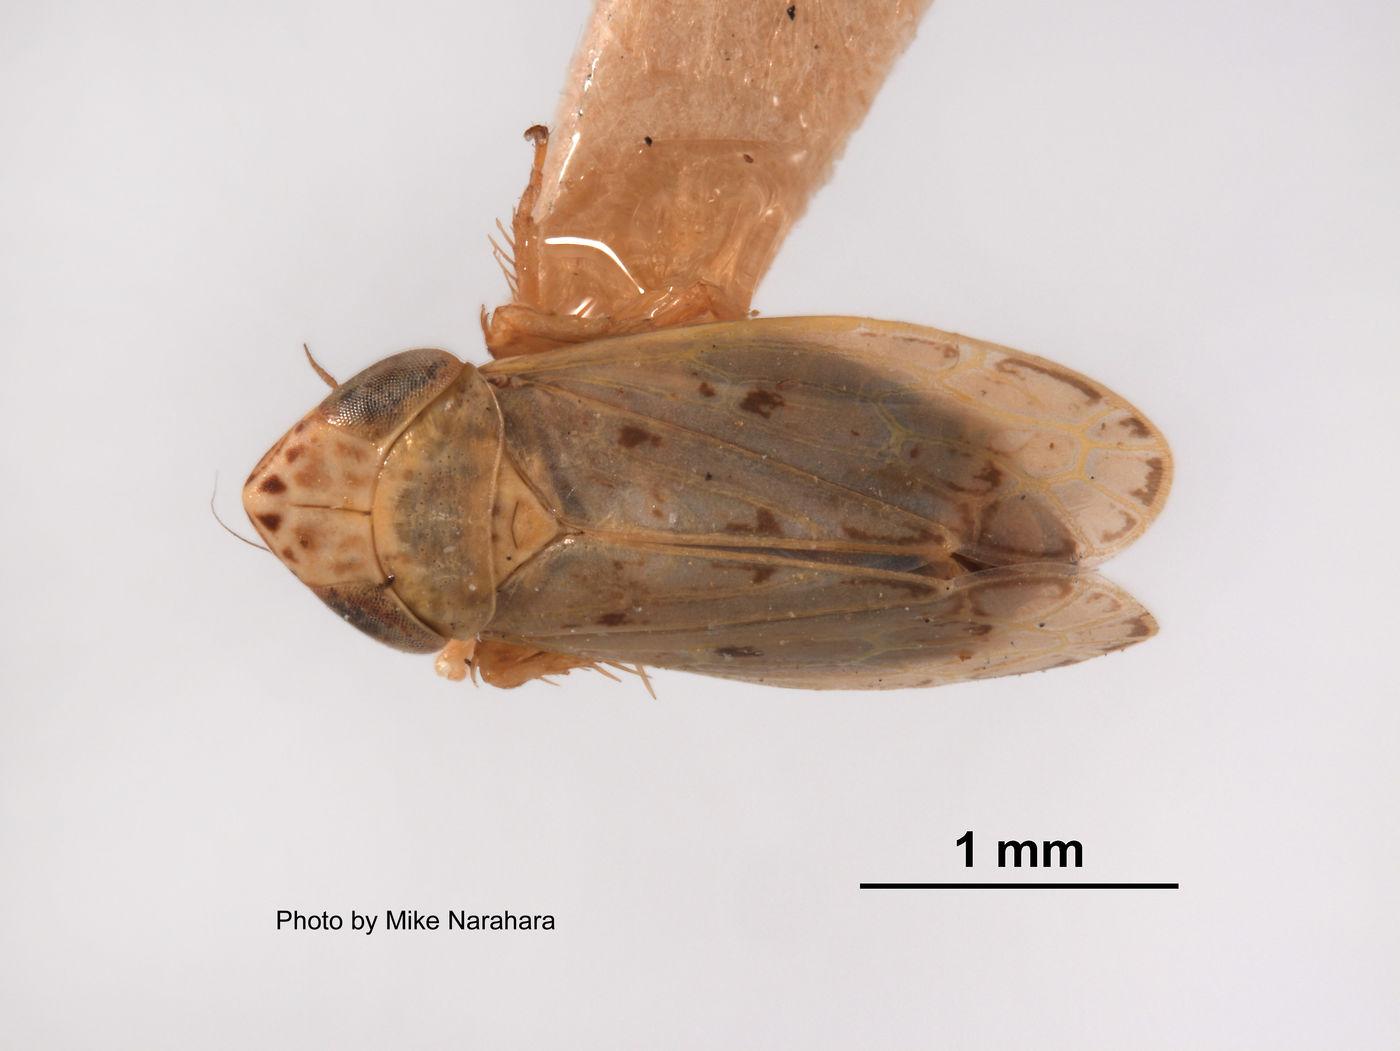 Deltocephalus cahuilla image